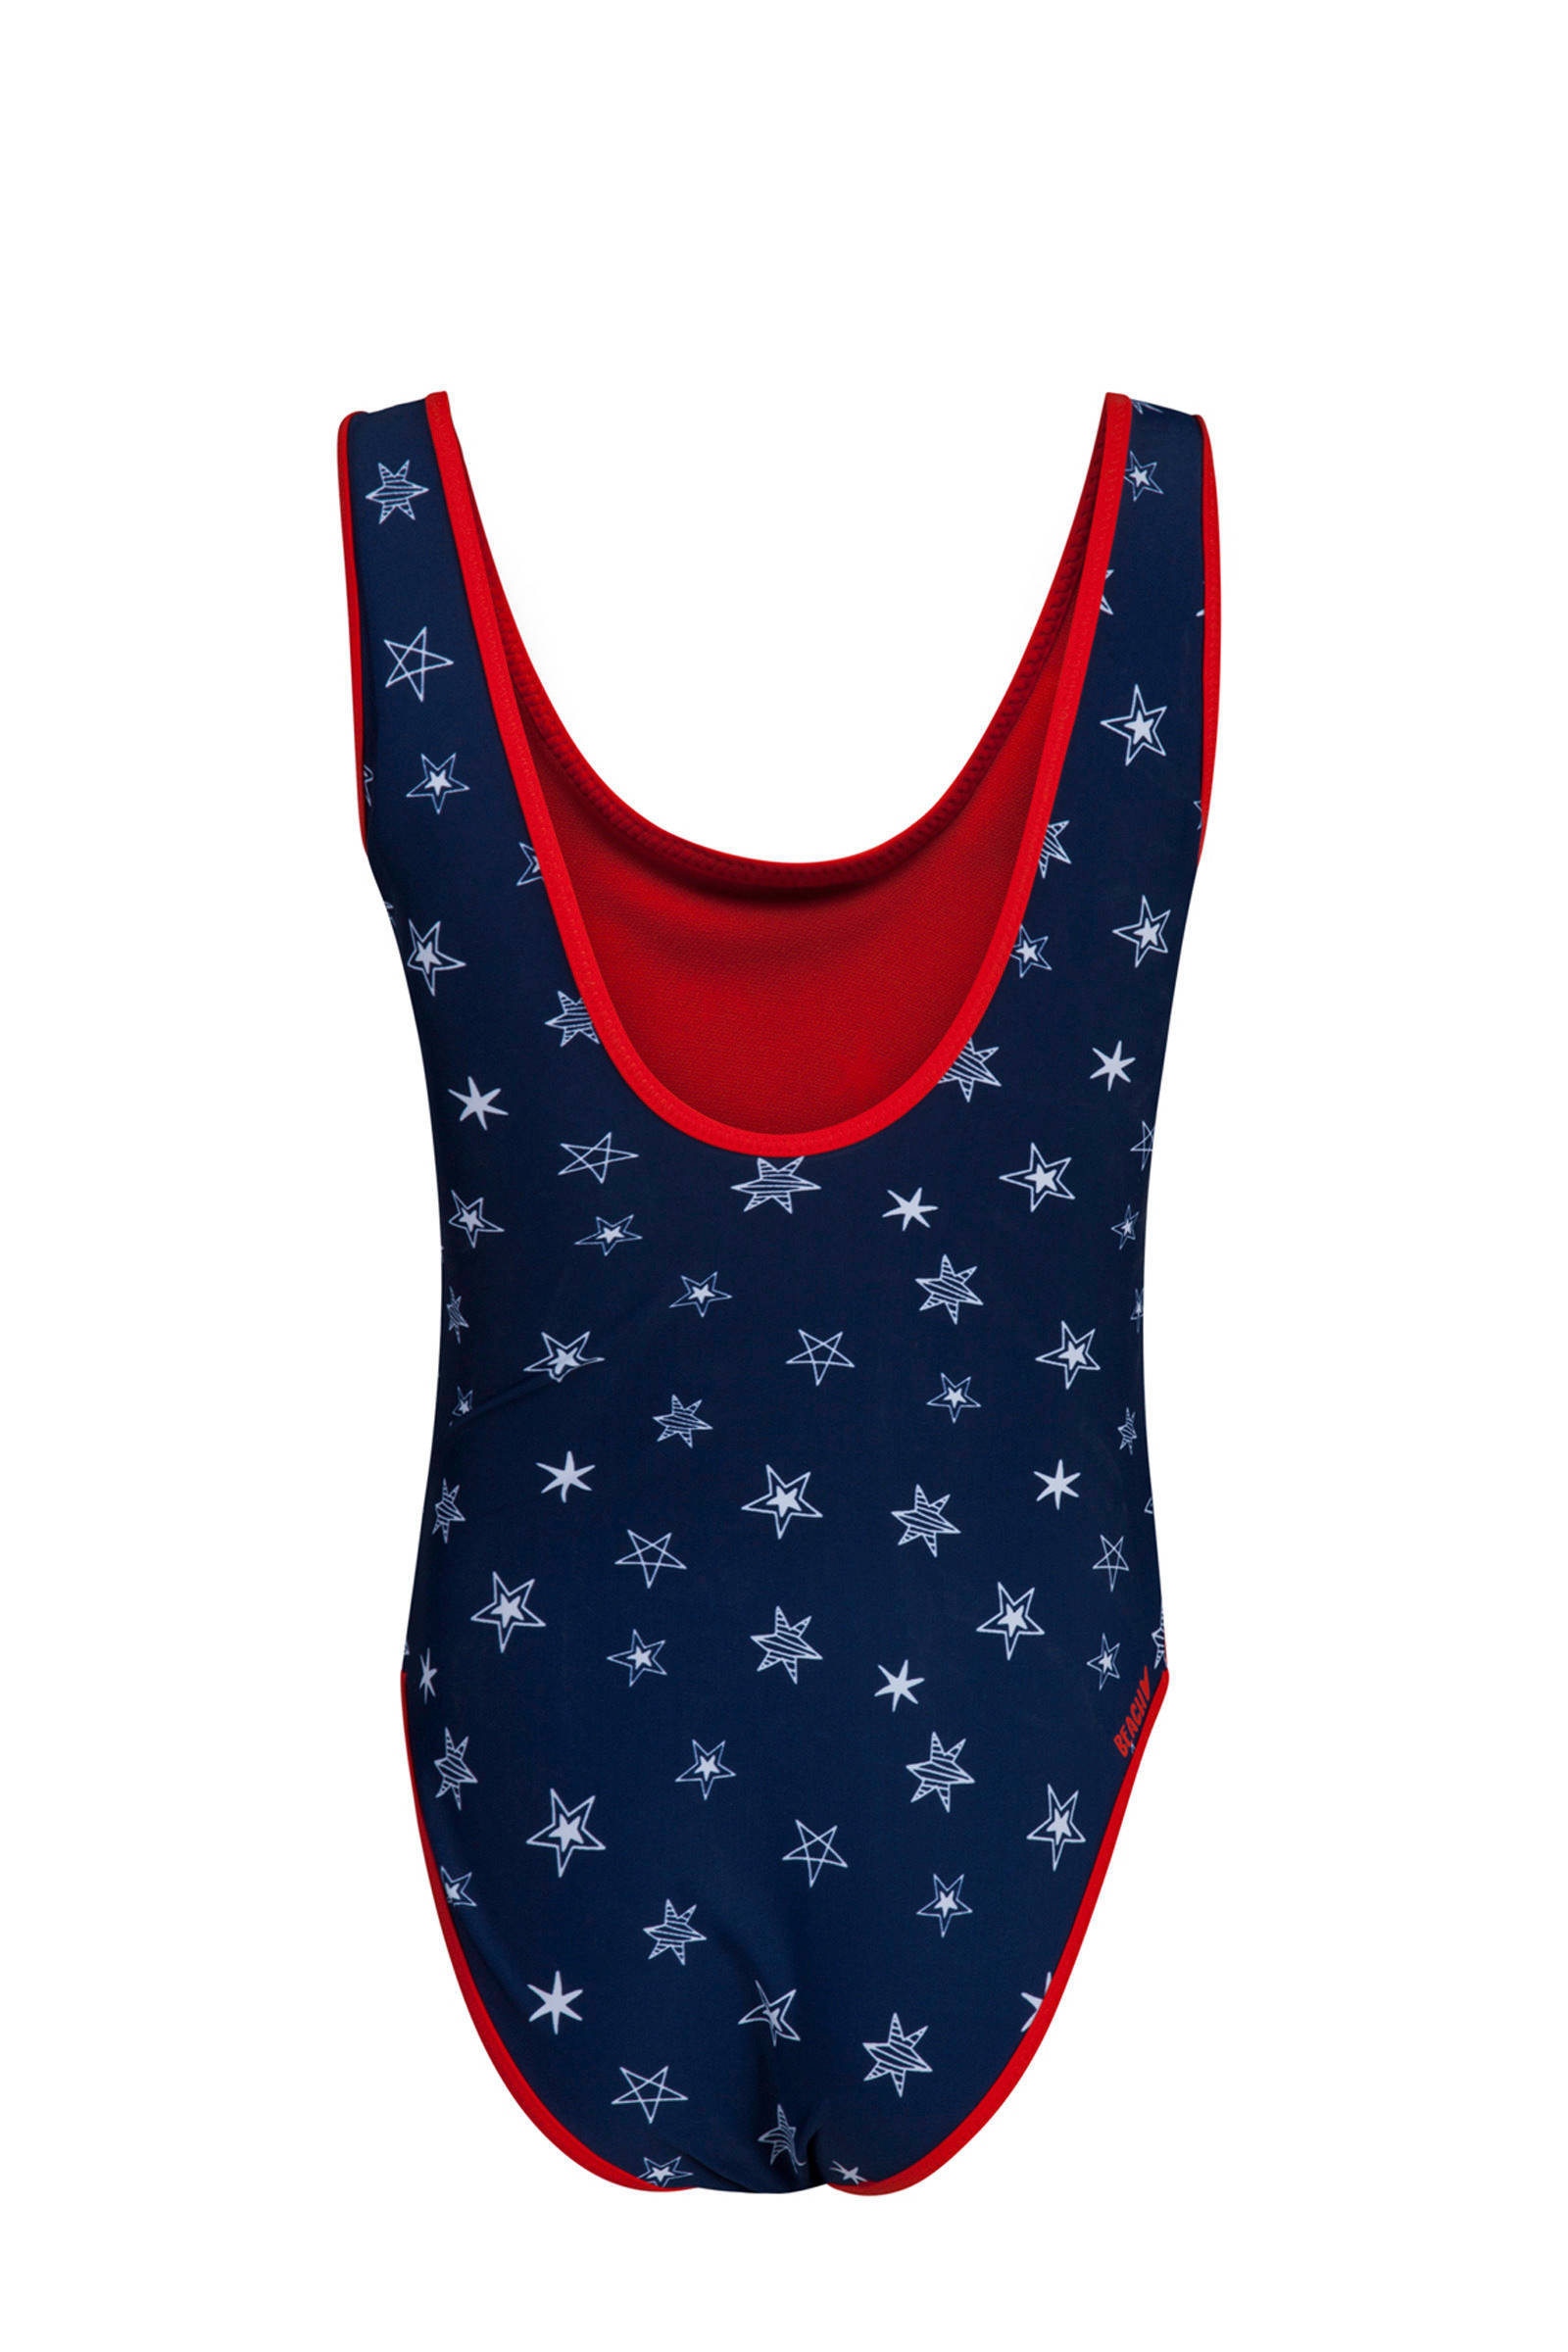 Badpak Fashion.We Fashion Badpak Met Sterrenprint Blauw Wehkamp